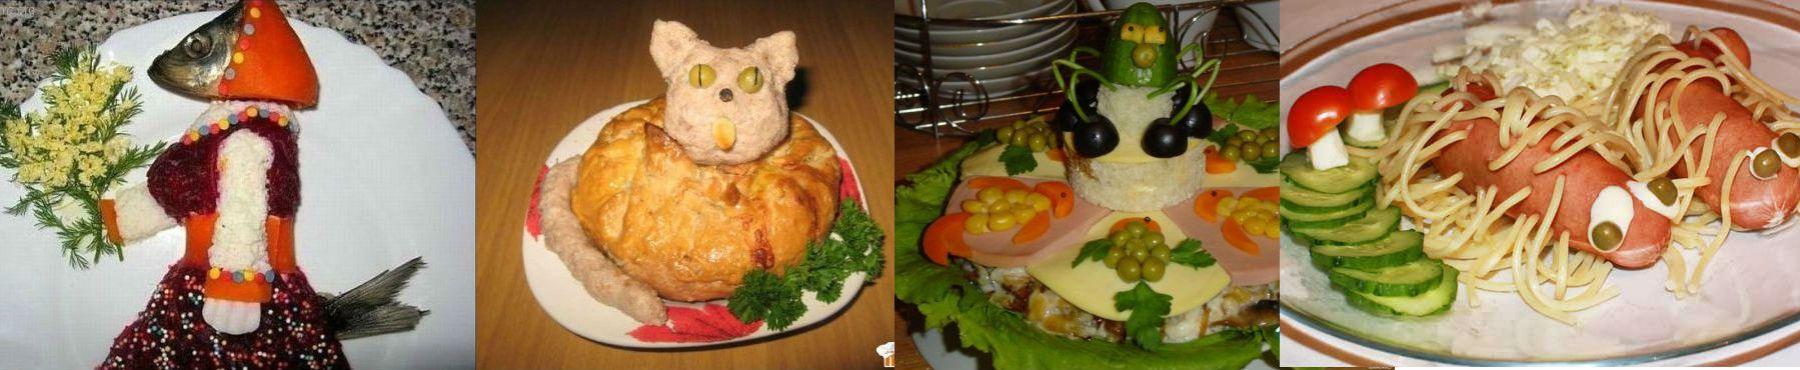 Comida cuqui fail: El tópic de los horrores fotogénicos culinarios - Página 4 1434382076_759834_1434388998_media_normal